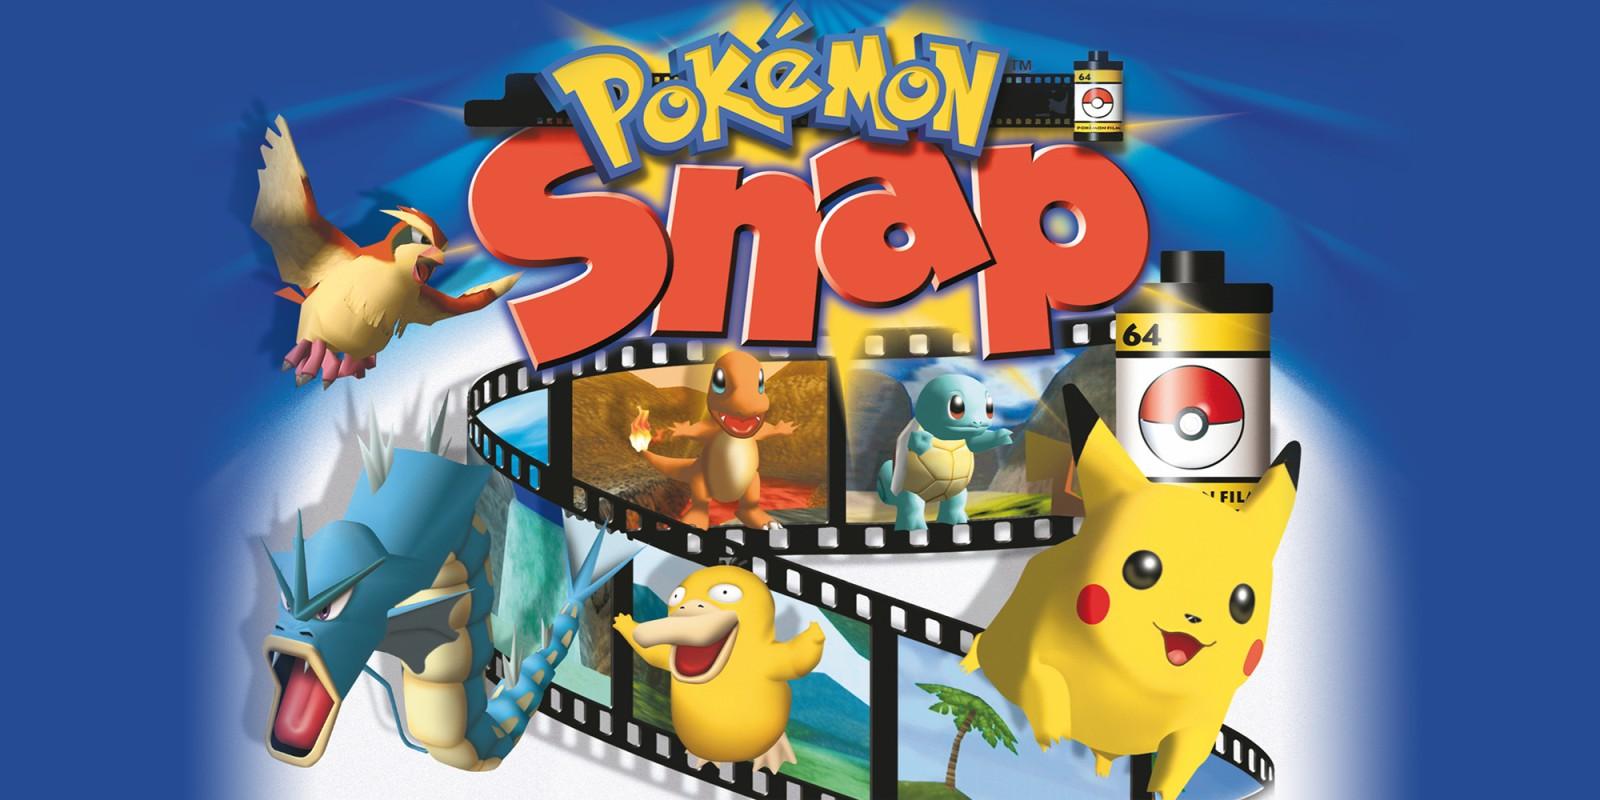 Pokemon Snap Nintendo 64 Juegos Nintendo